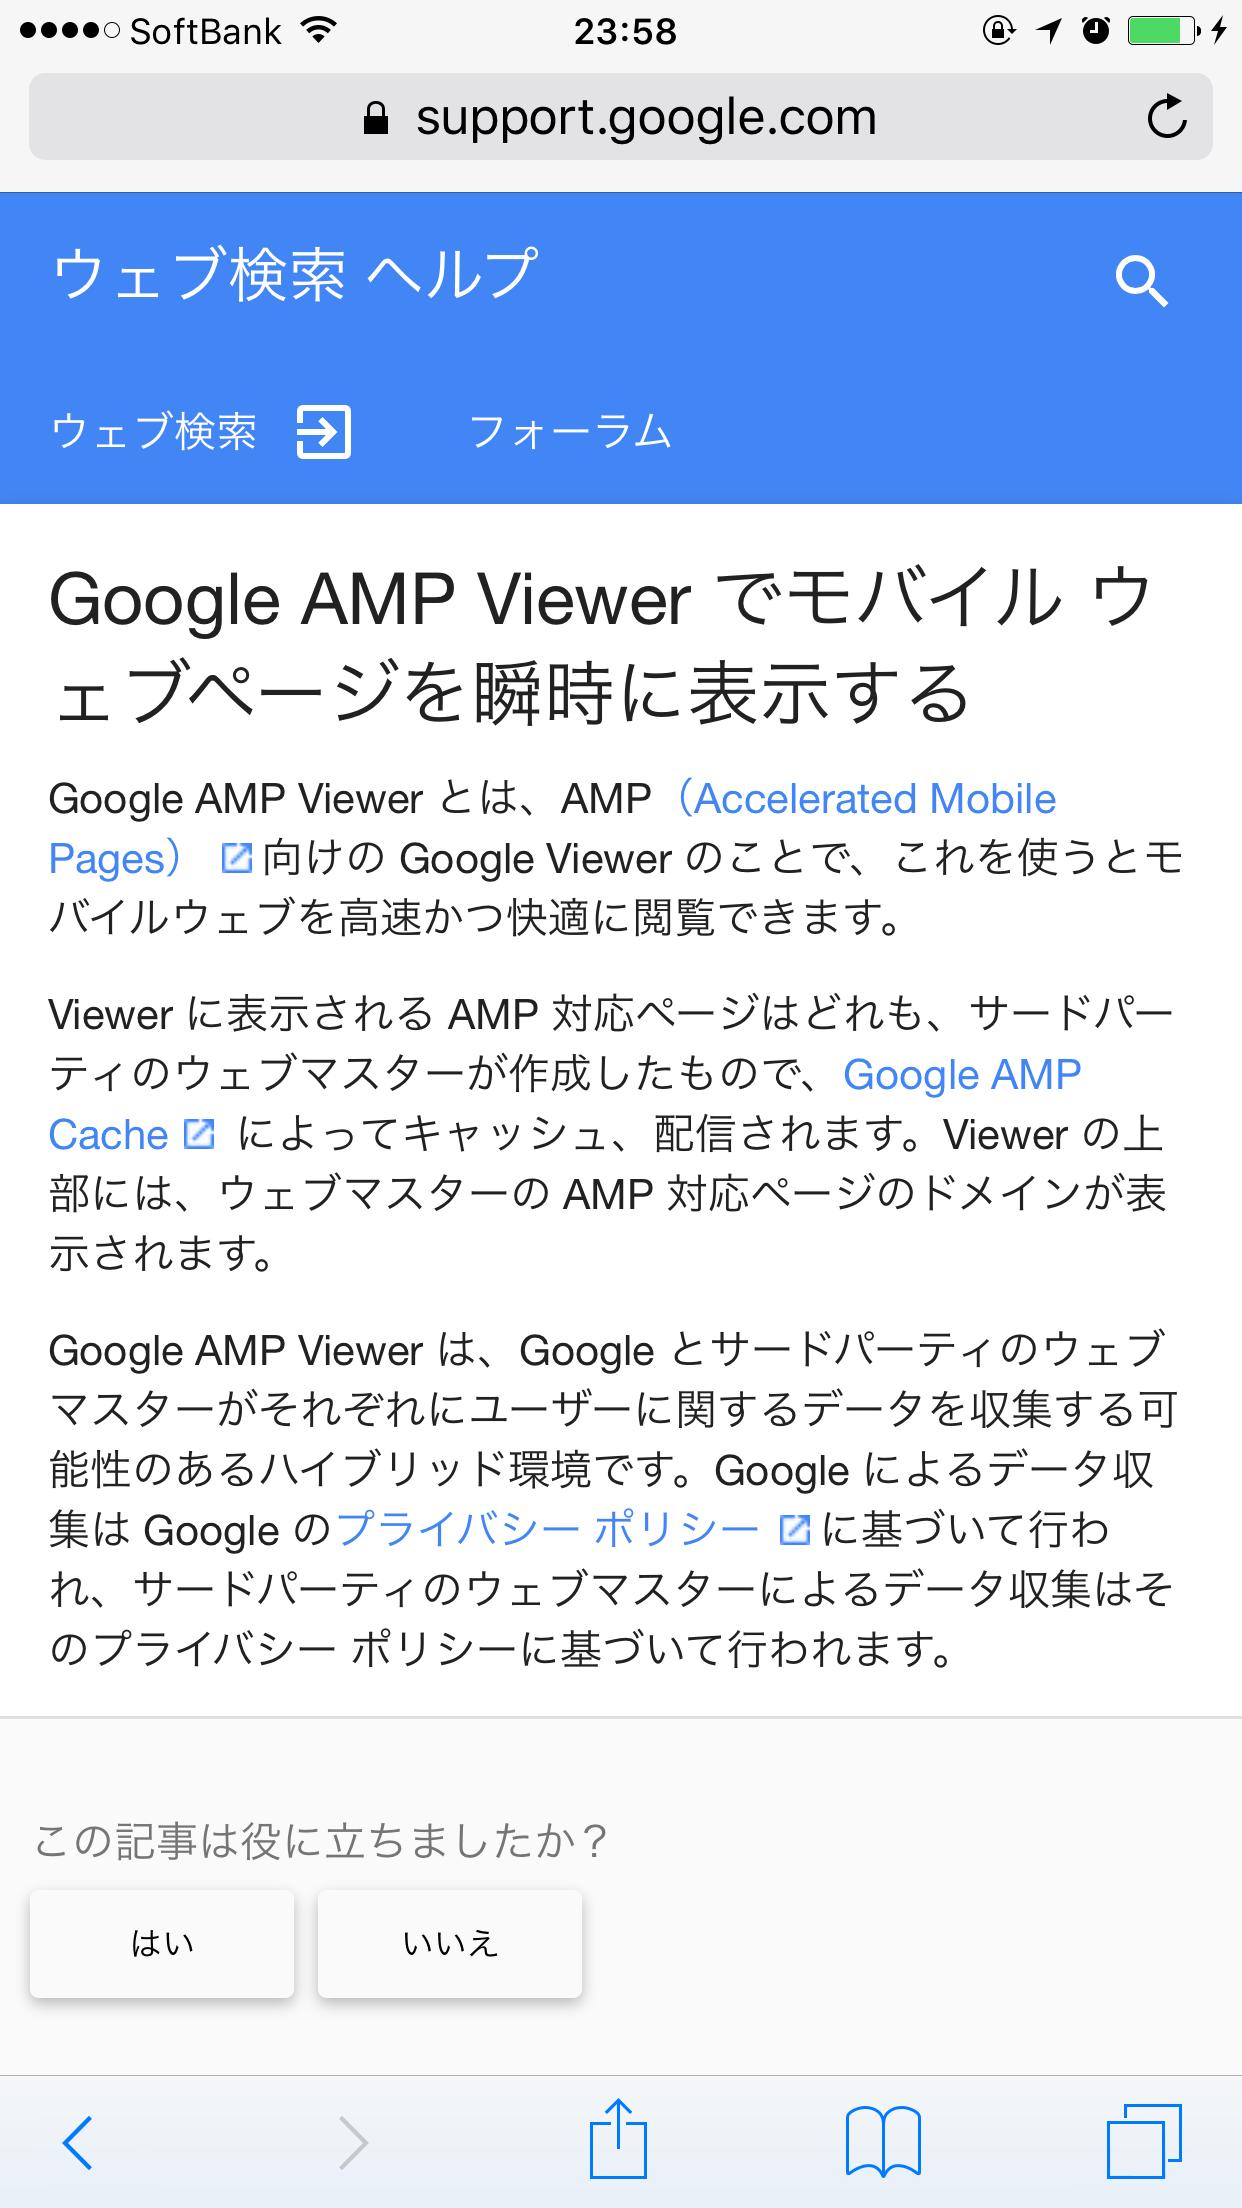 iOSでGoogle AMPの元ページURLなどを表示